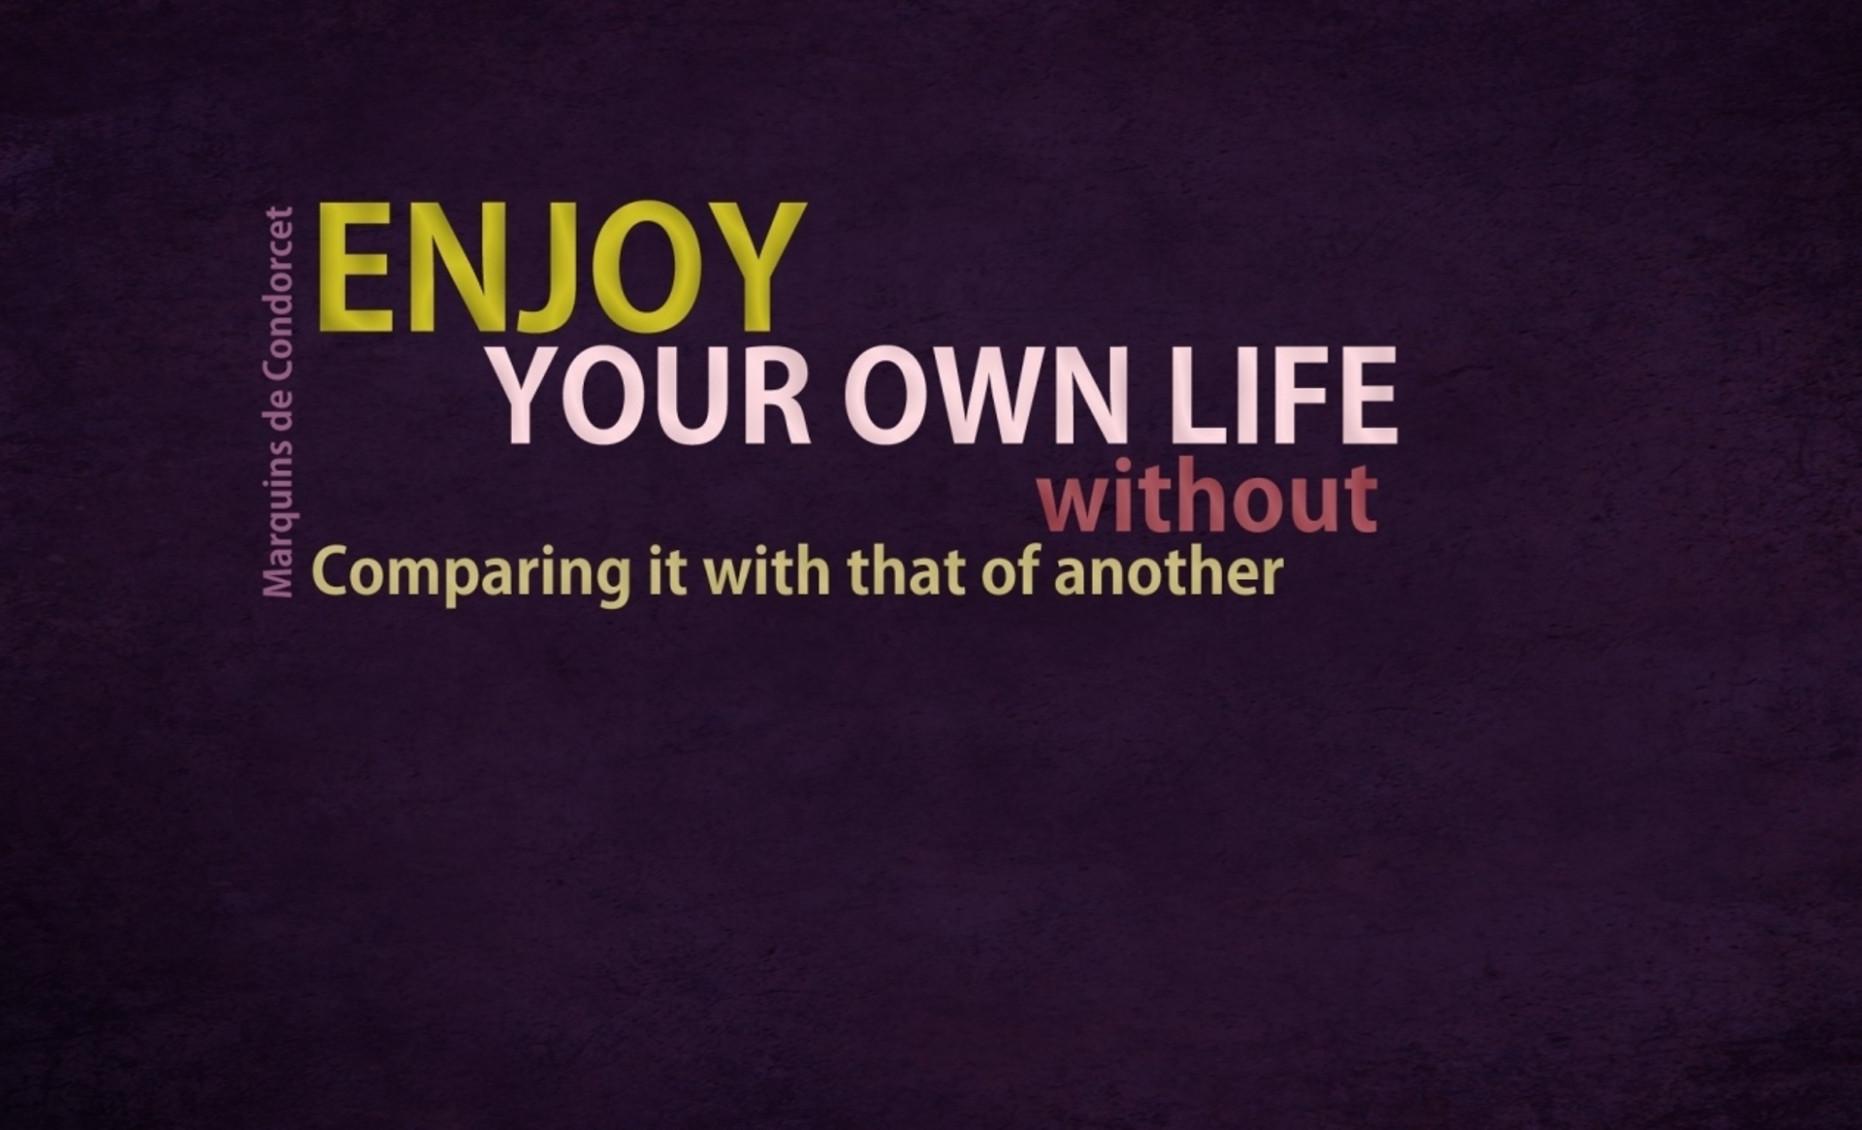 Enjoy Your Life Quotes Desktop Wallpaper Cute Wallpapers